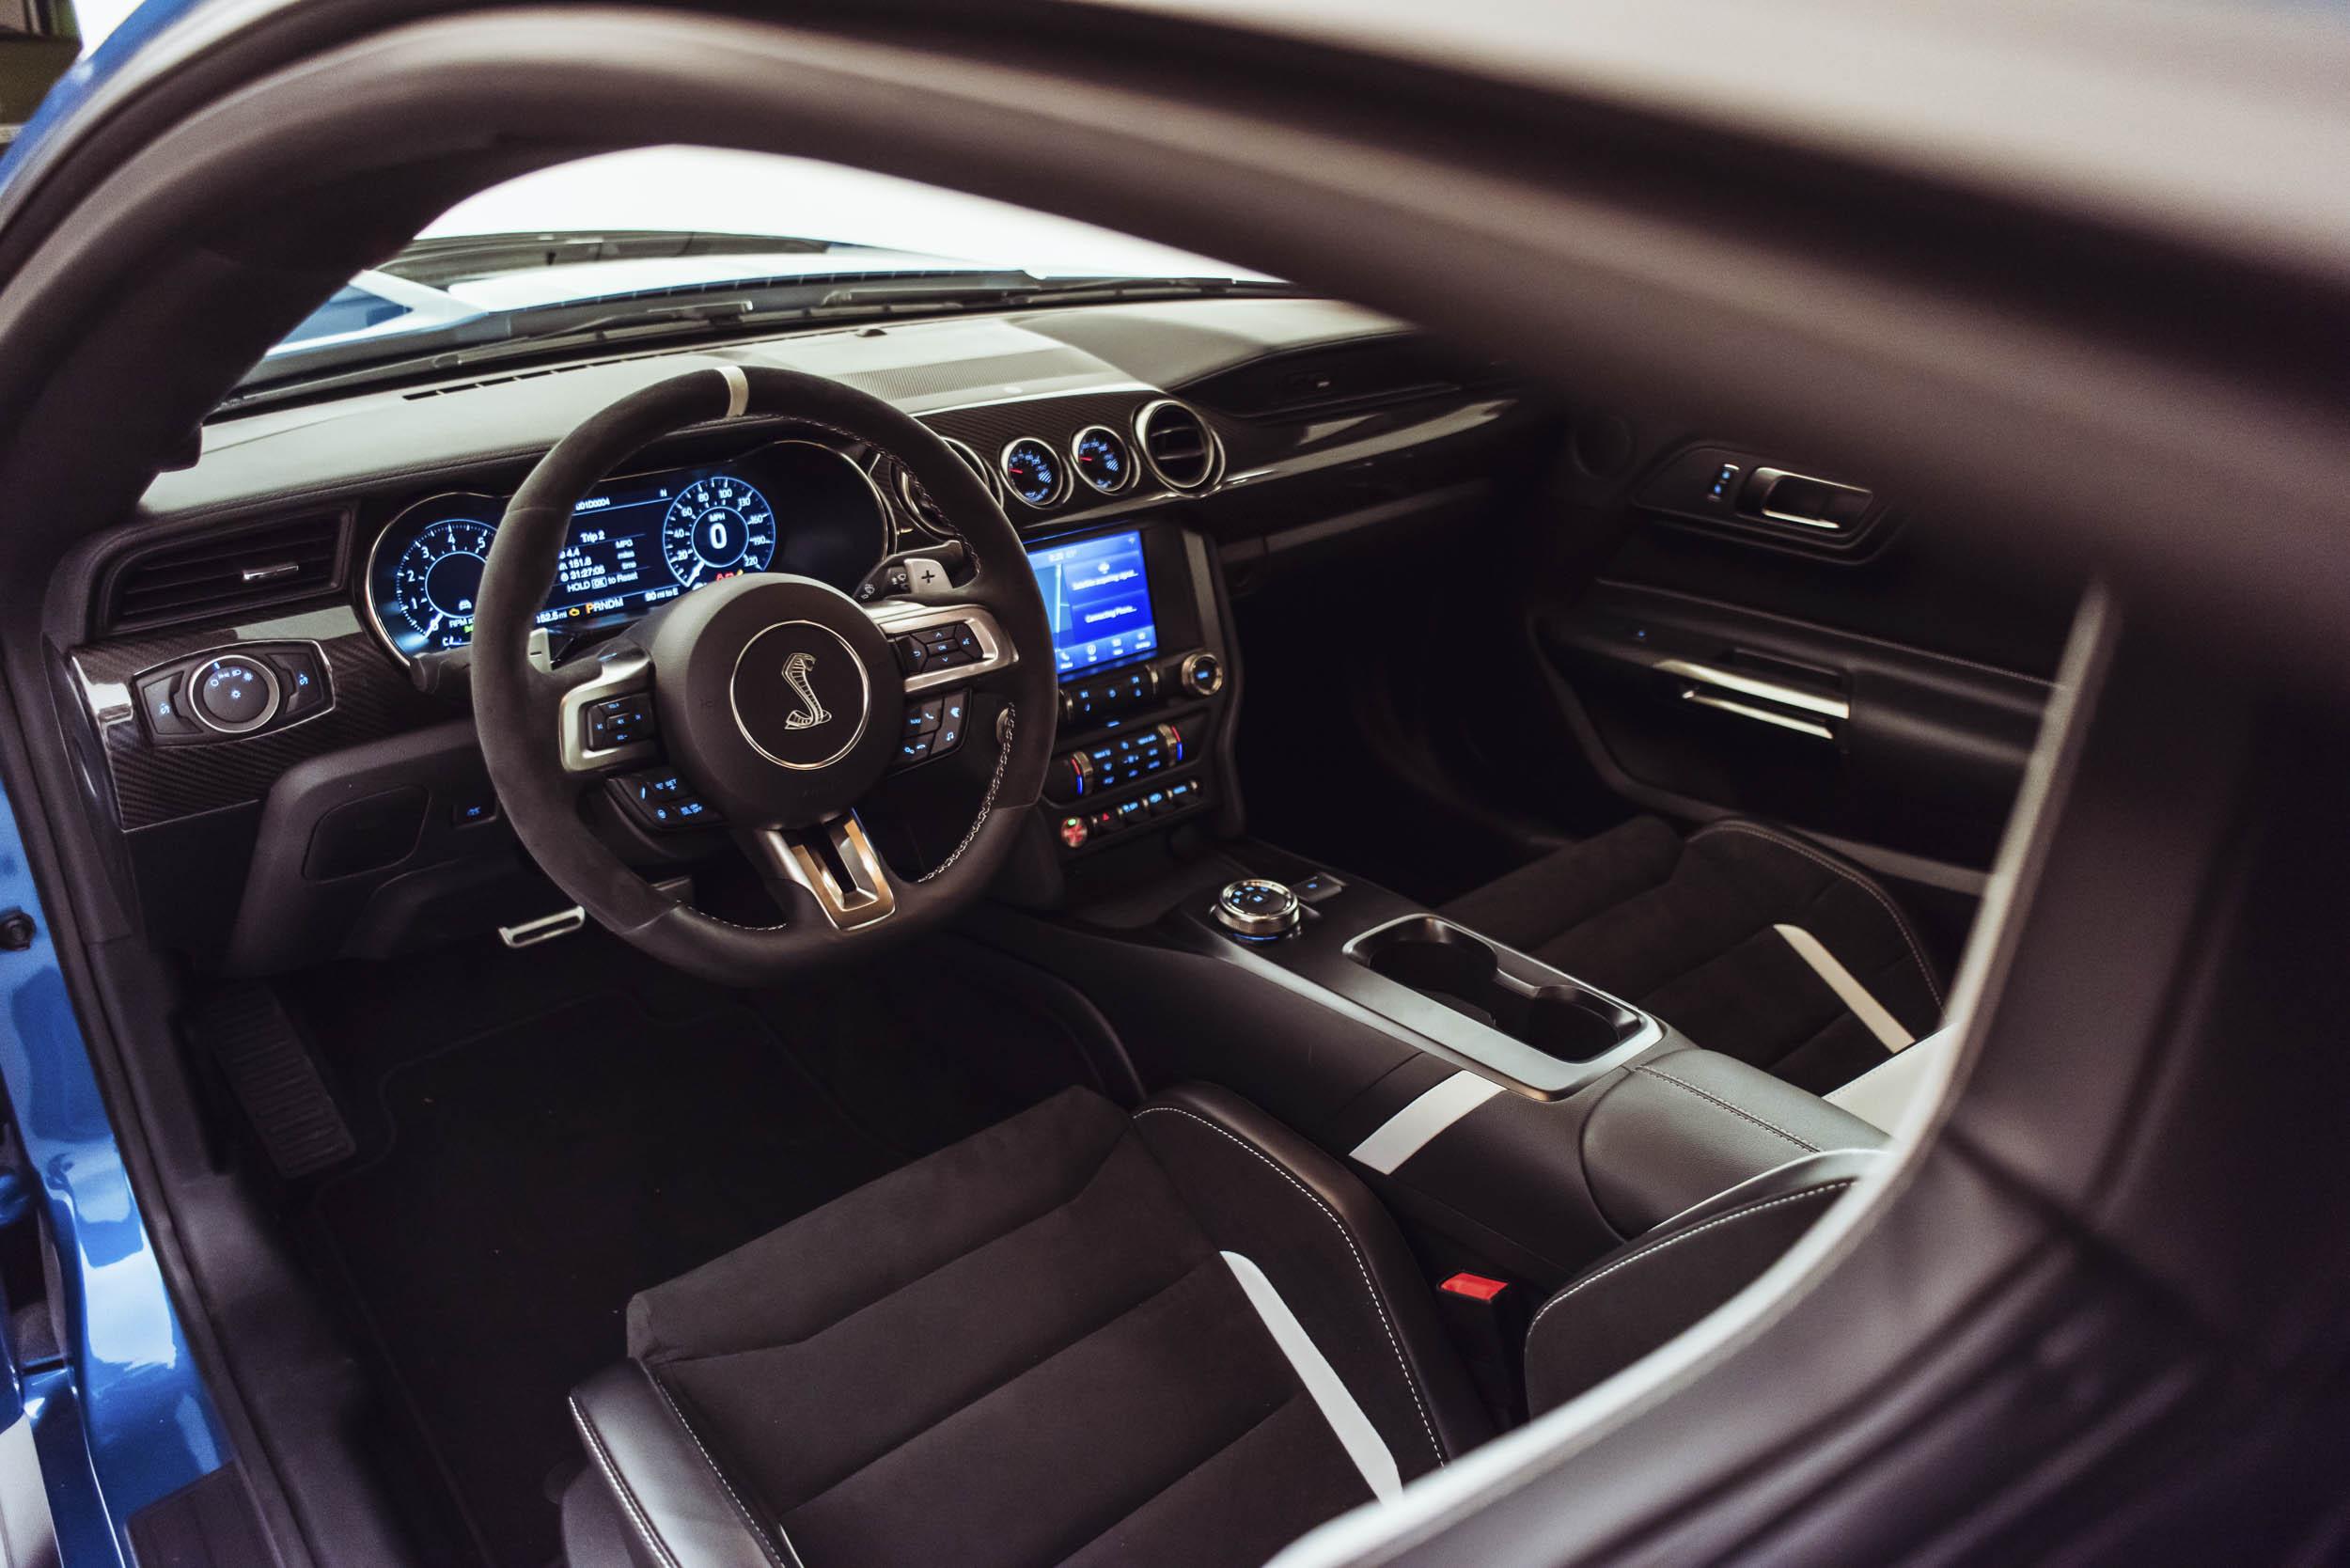 2020 Shelby GT500 cockpit